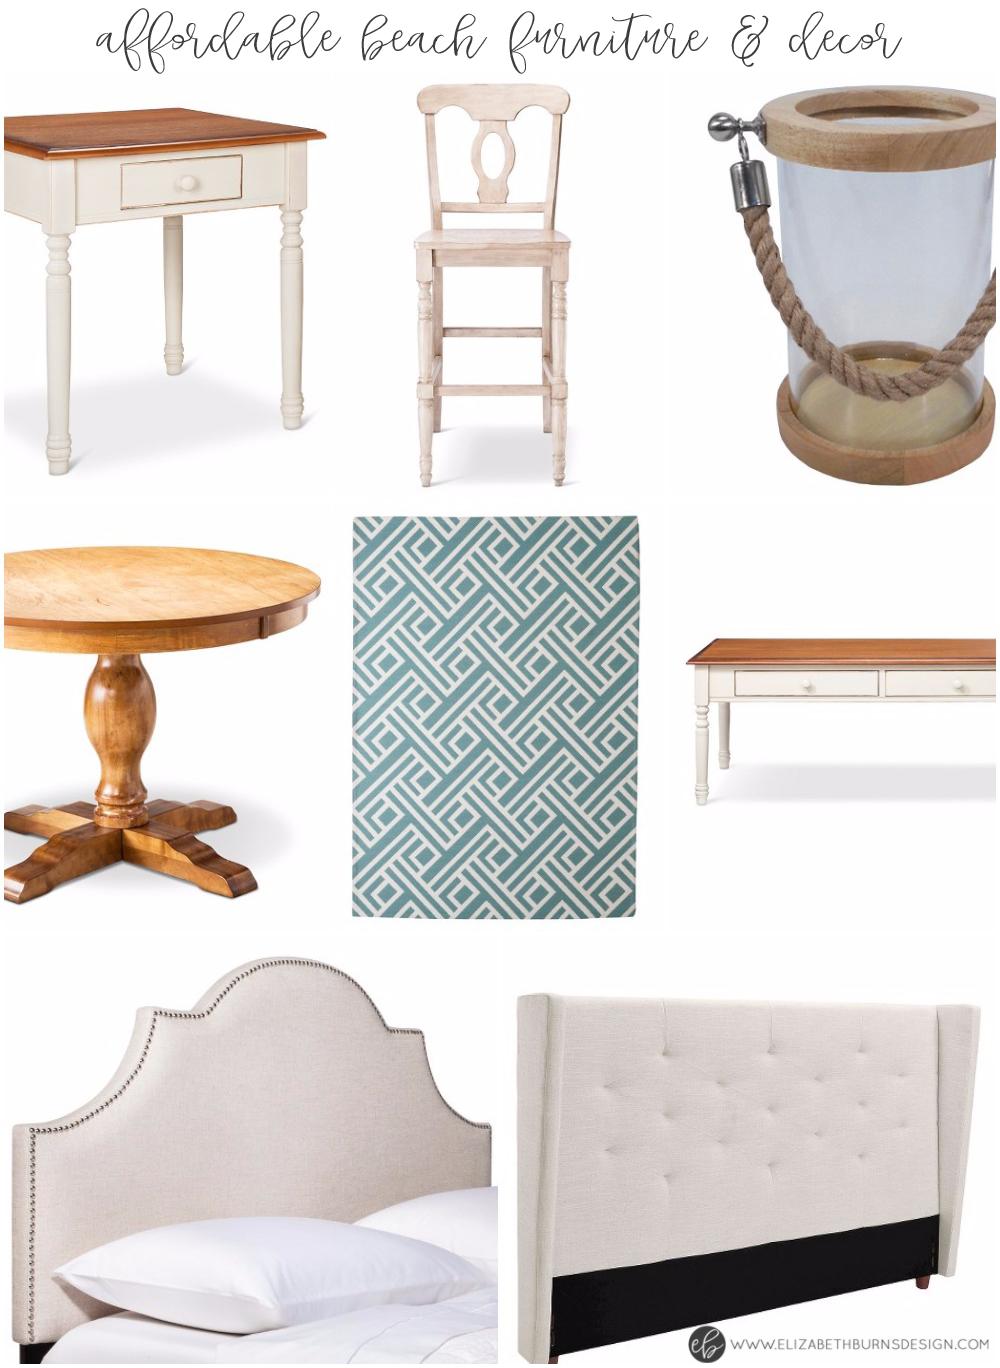 Elizabeth Burns Design   Affordable Beach Inspired Furniture and Decor - Target Clearance